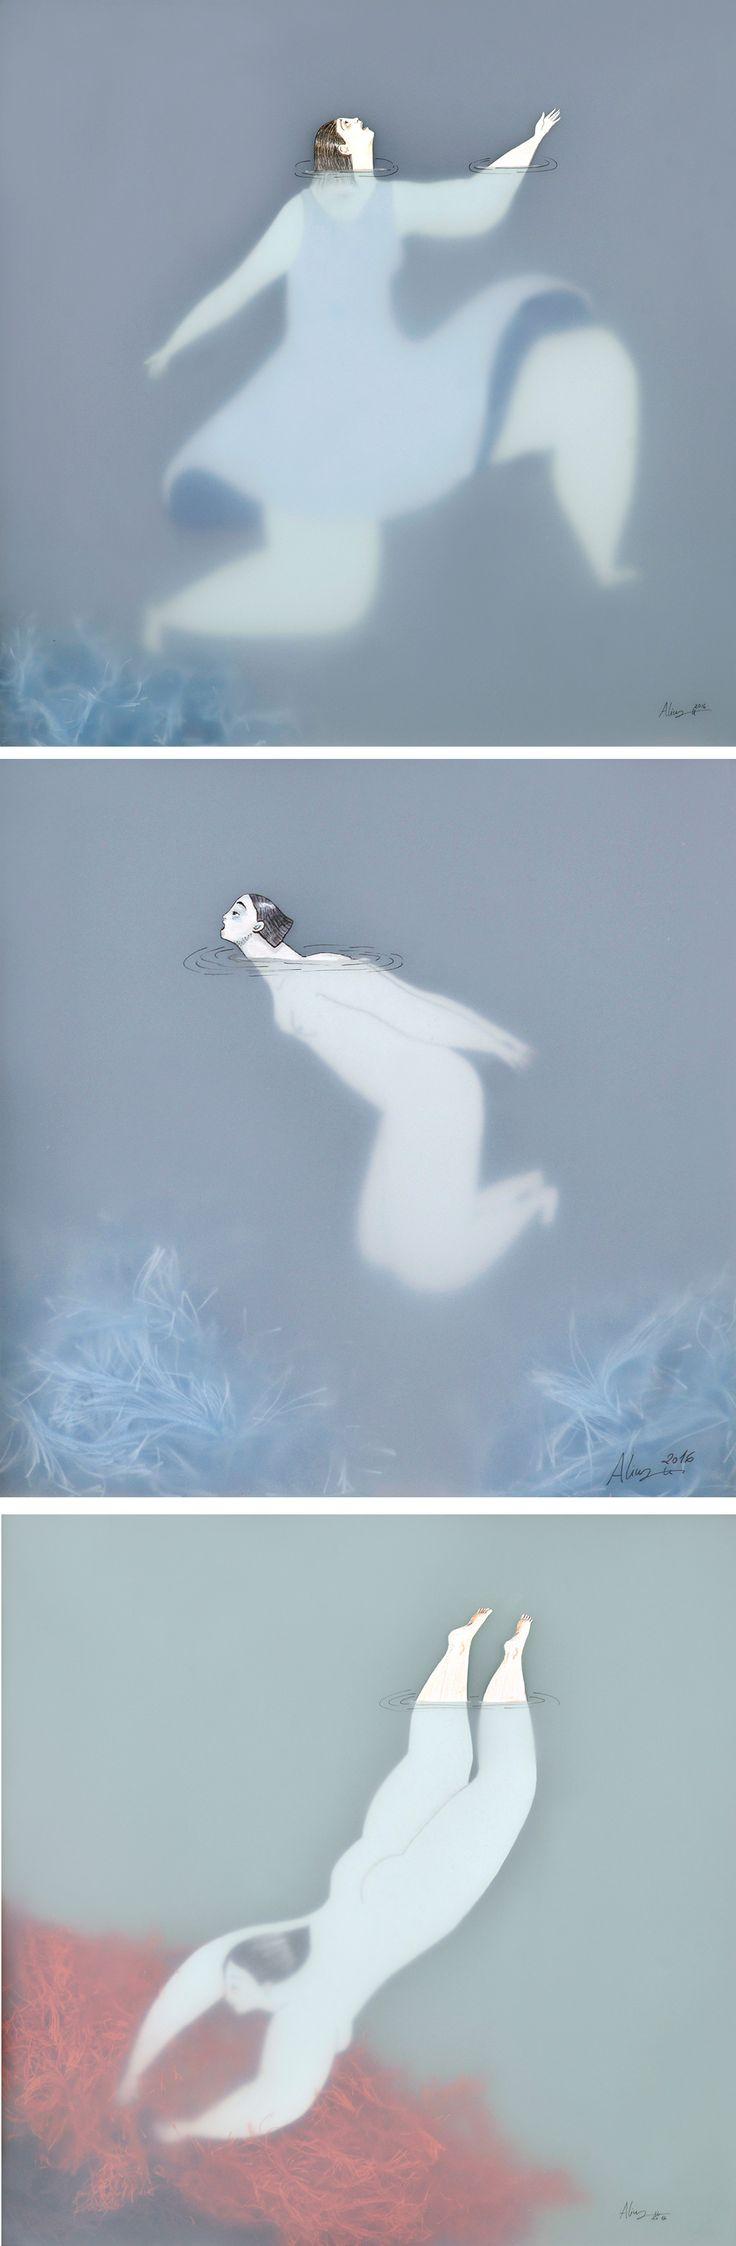 Illustration | women swimming illustration | Sonia Alins | women in the water